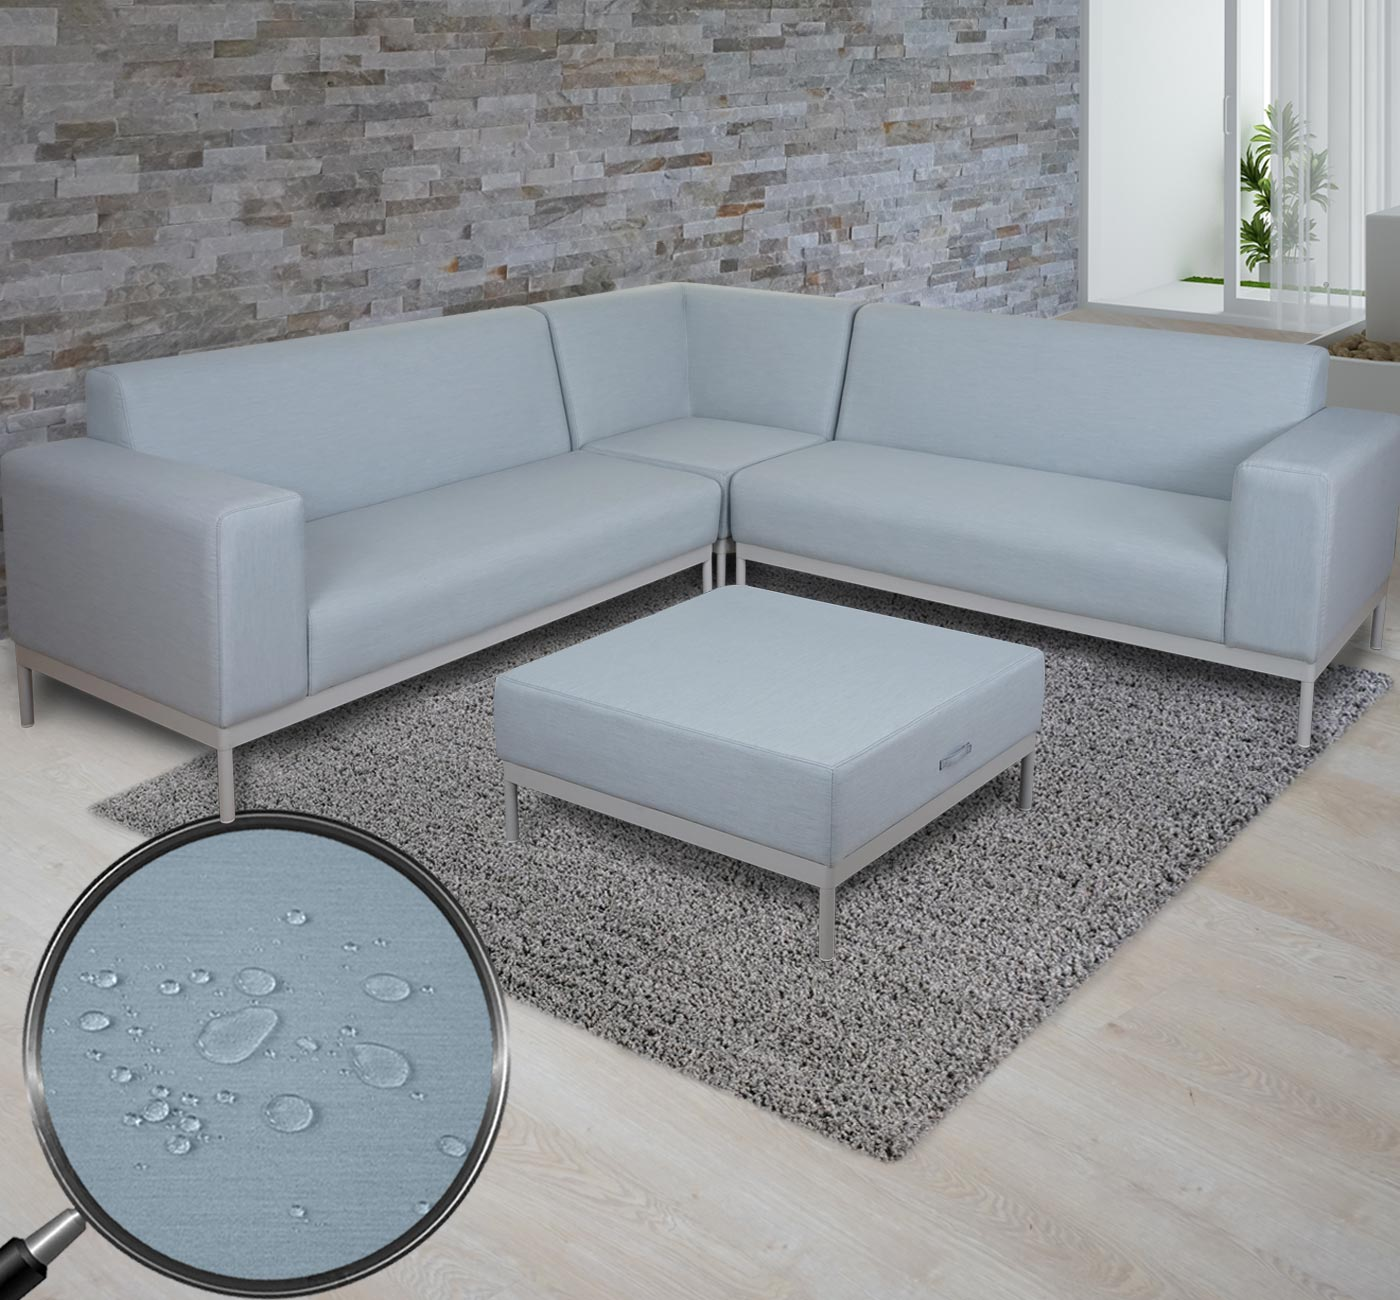 Ecksofa hwc c47 sofa loungesofa couch textil indoor for Ecksofa textil